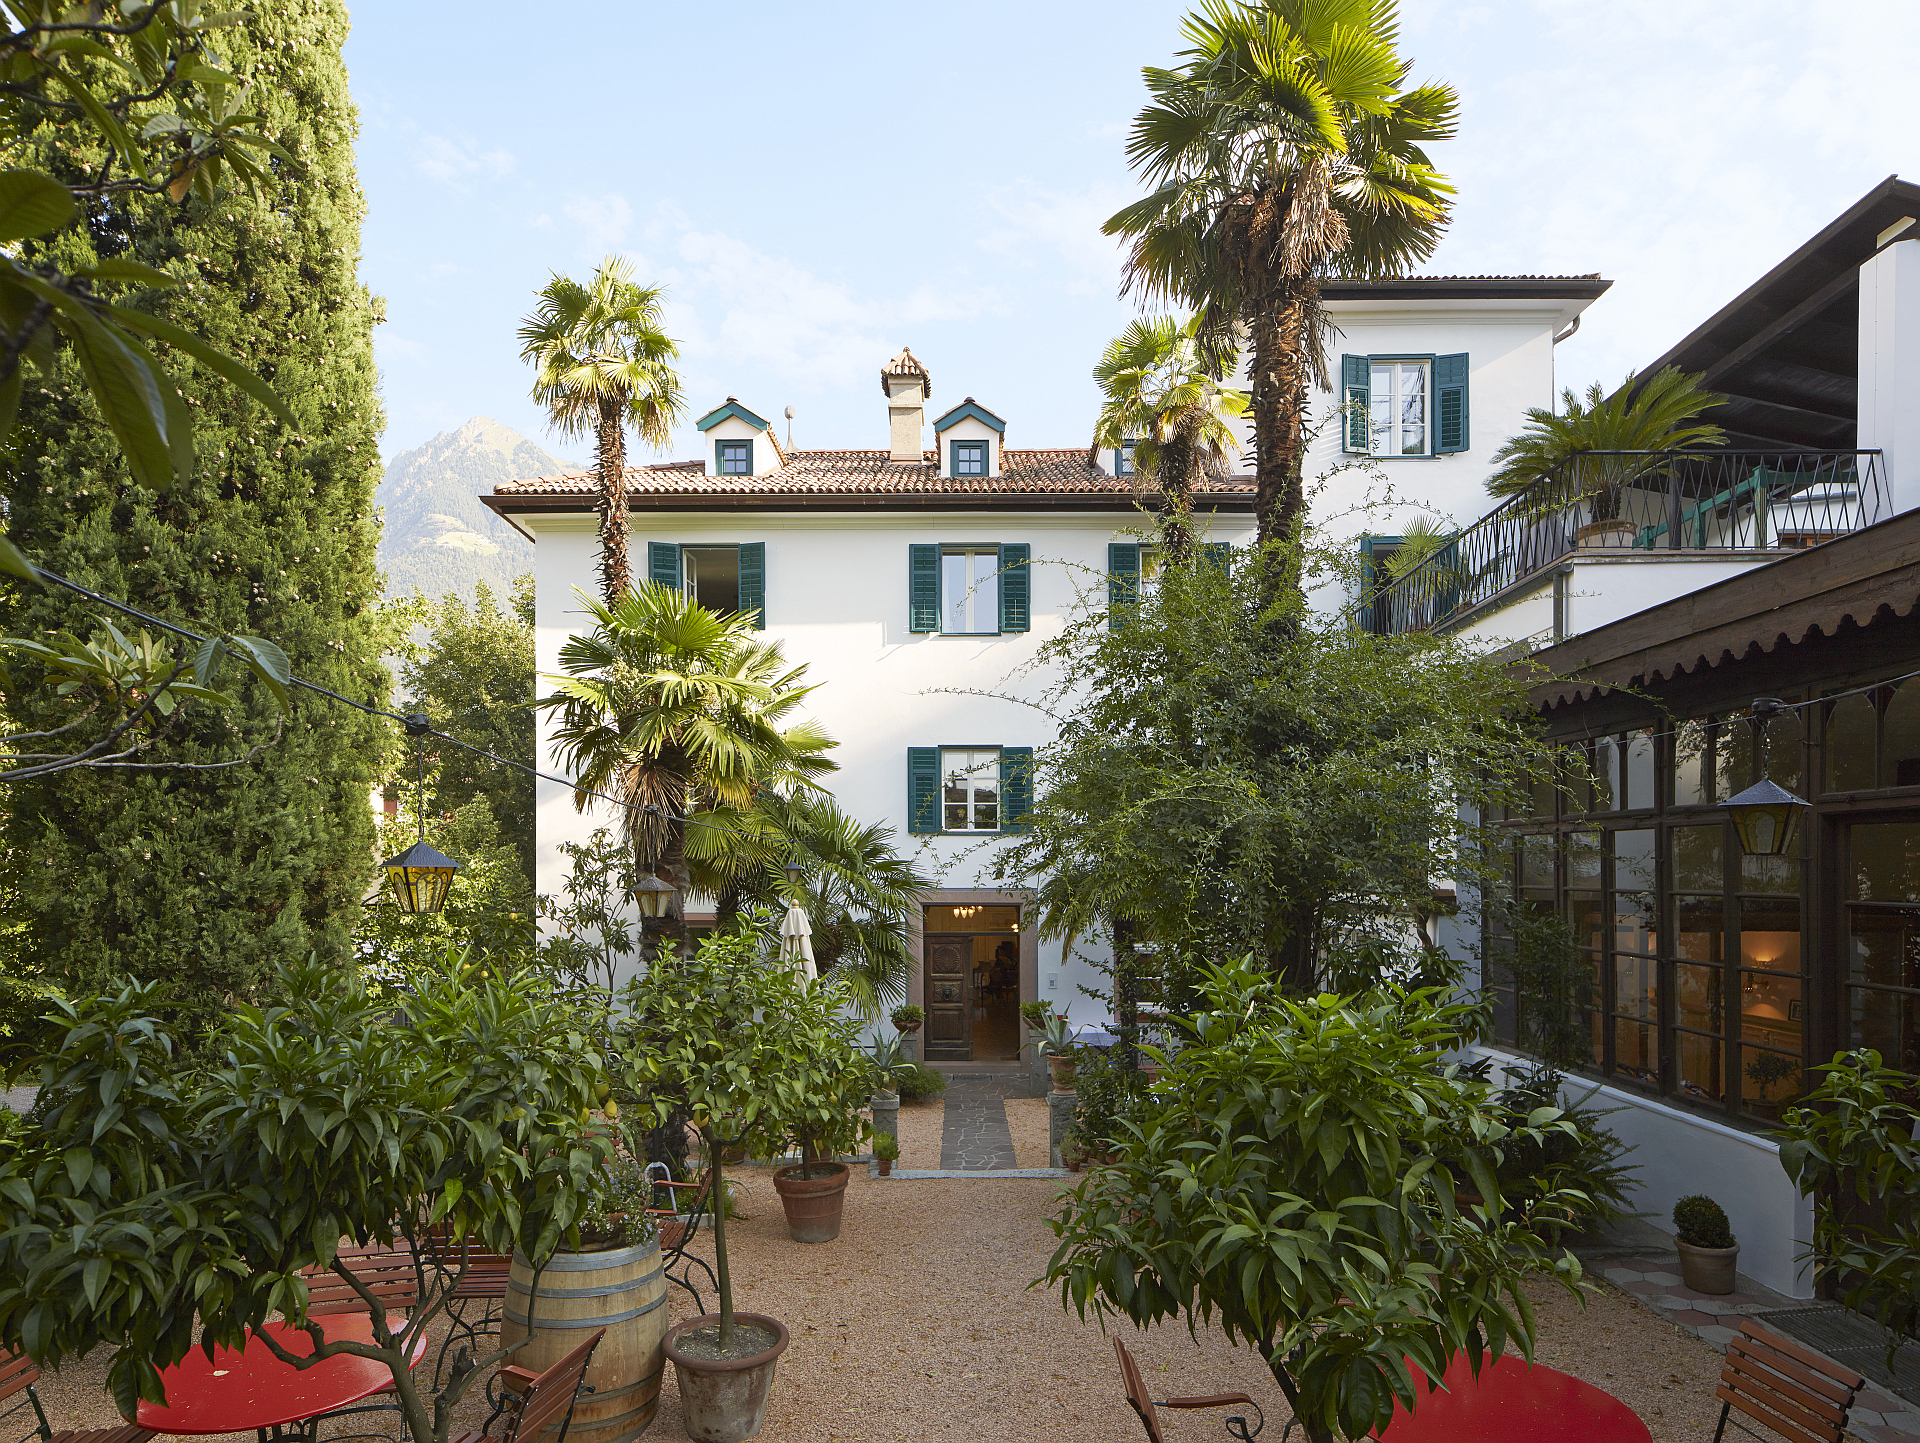 Hotel Ottmanngut in Merano